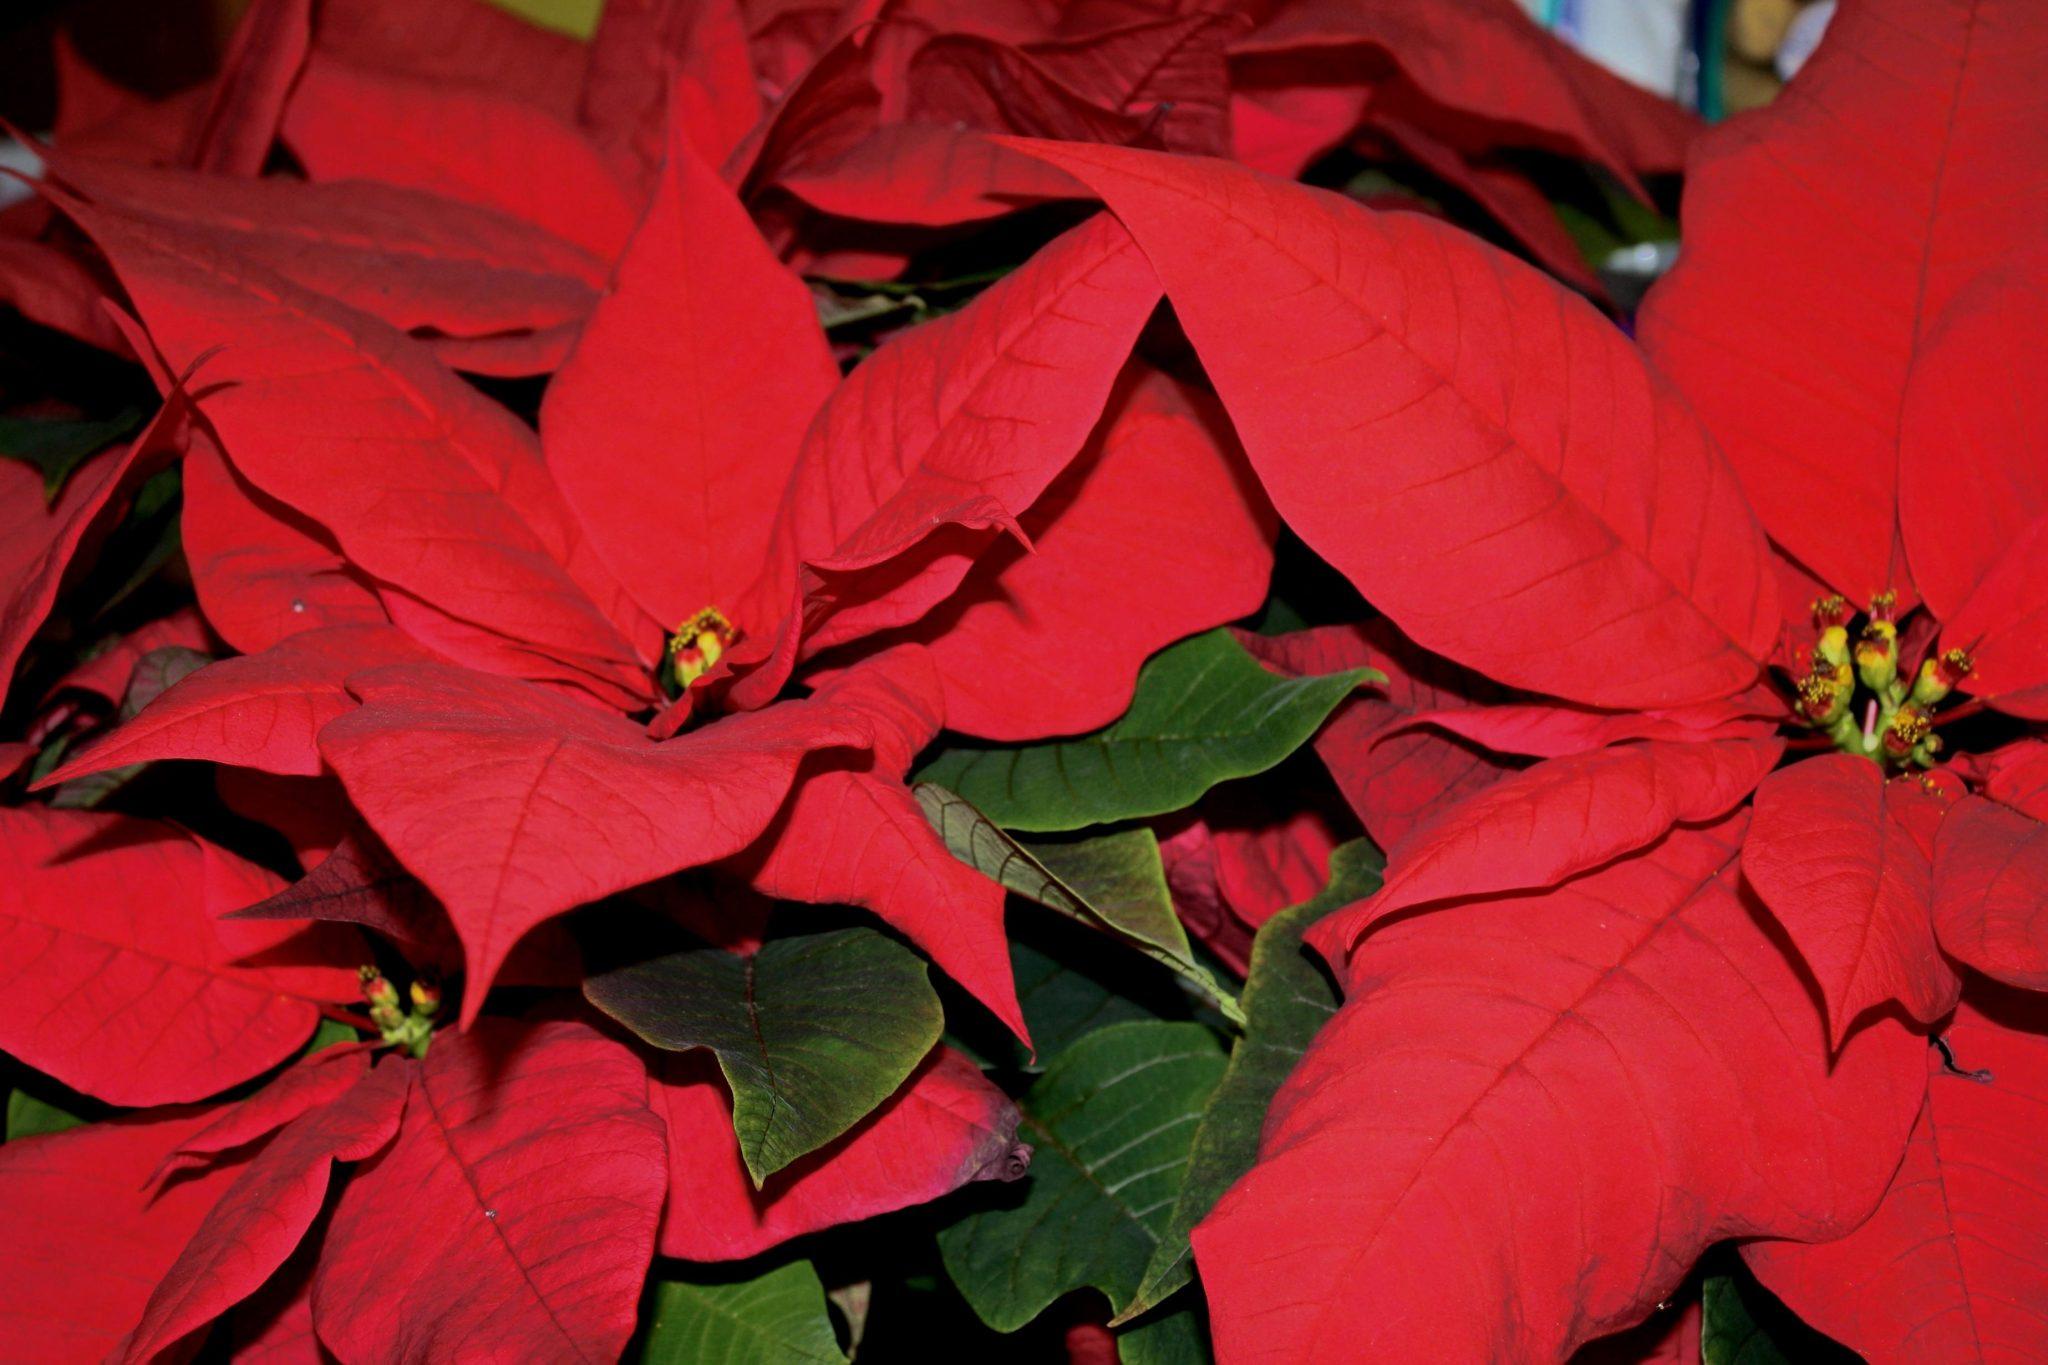 La flor de pascua es una planta decorativa